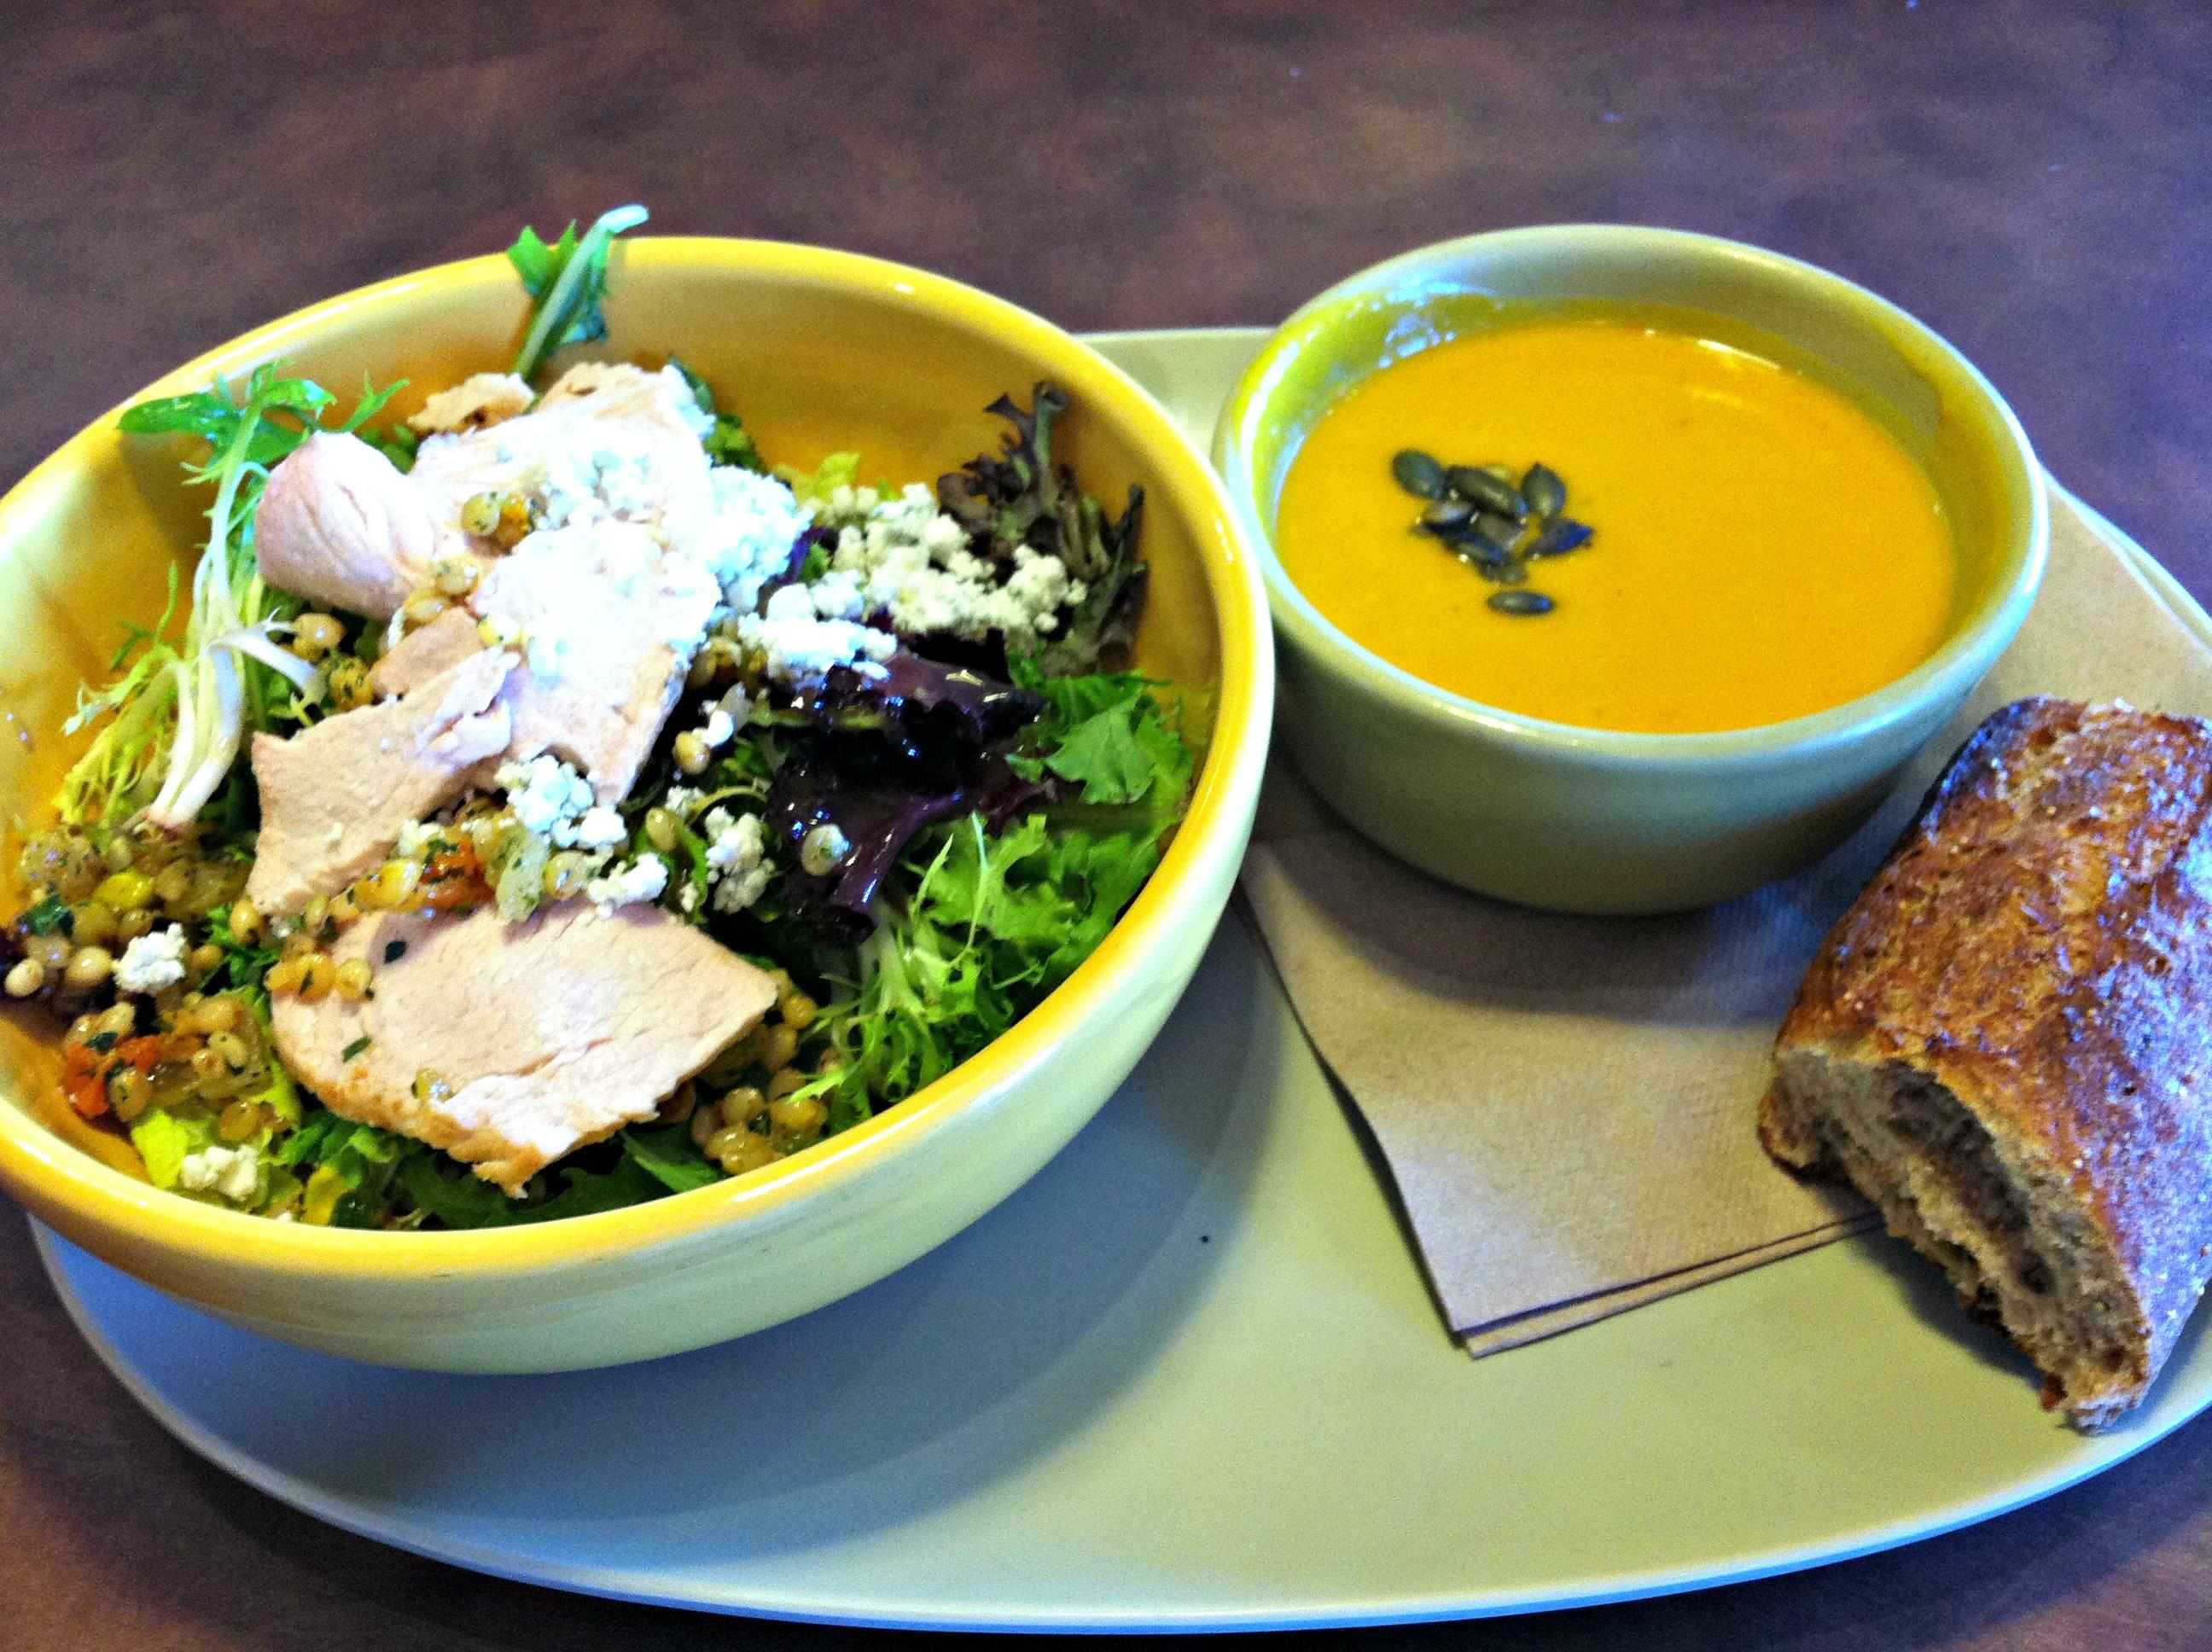 Panera Turkey Salad and squash soup